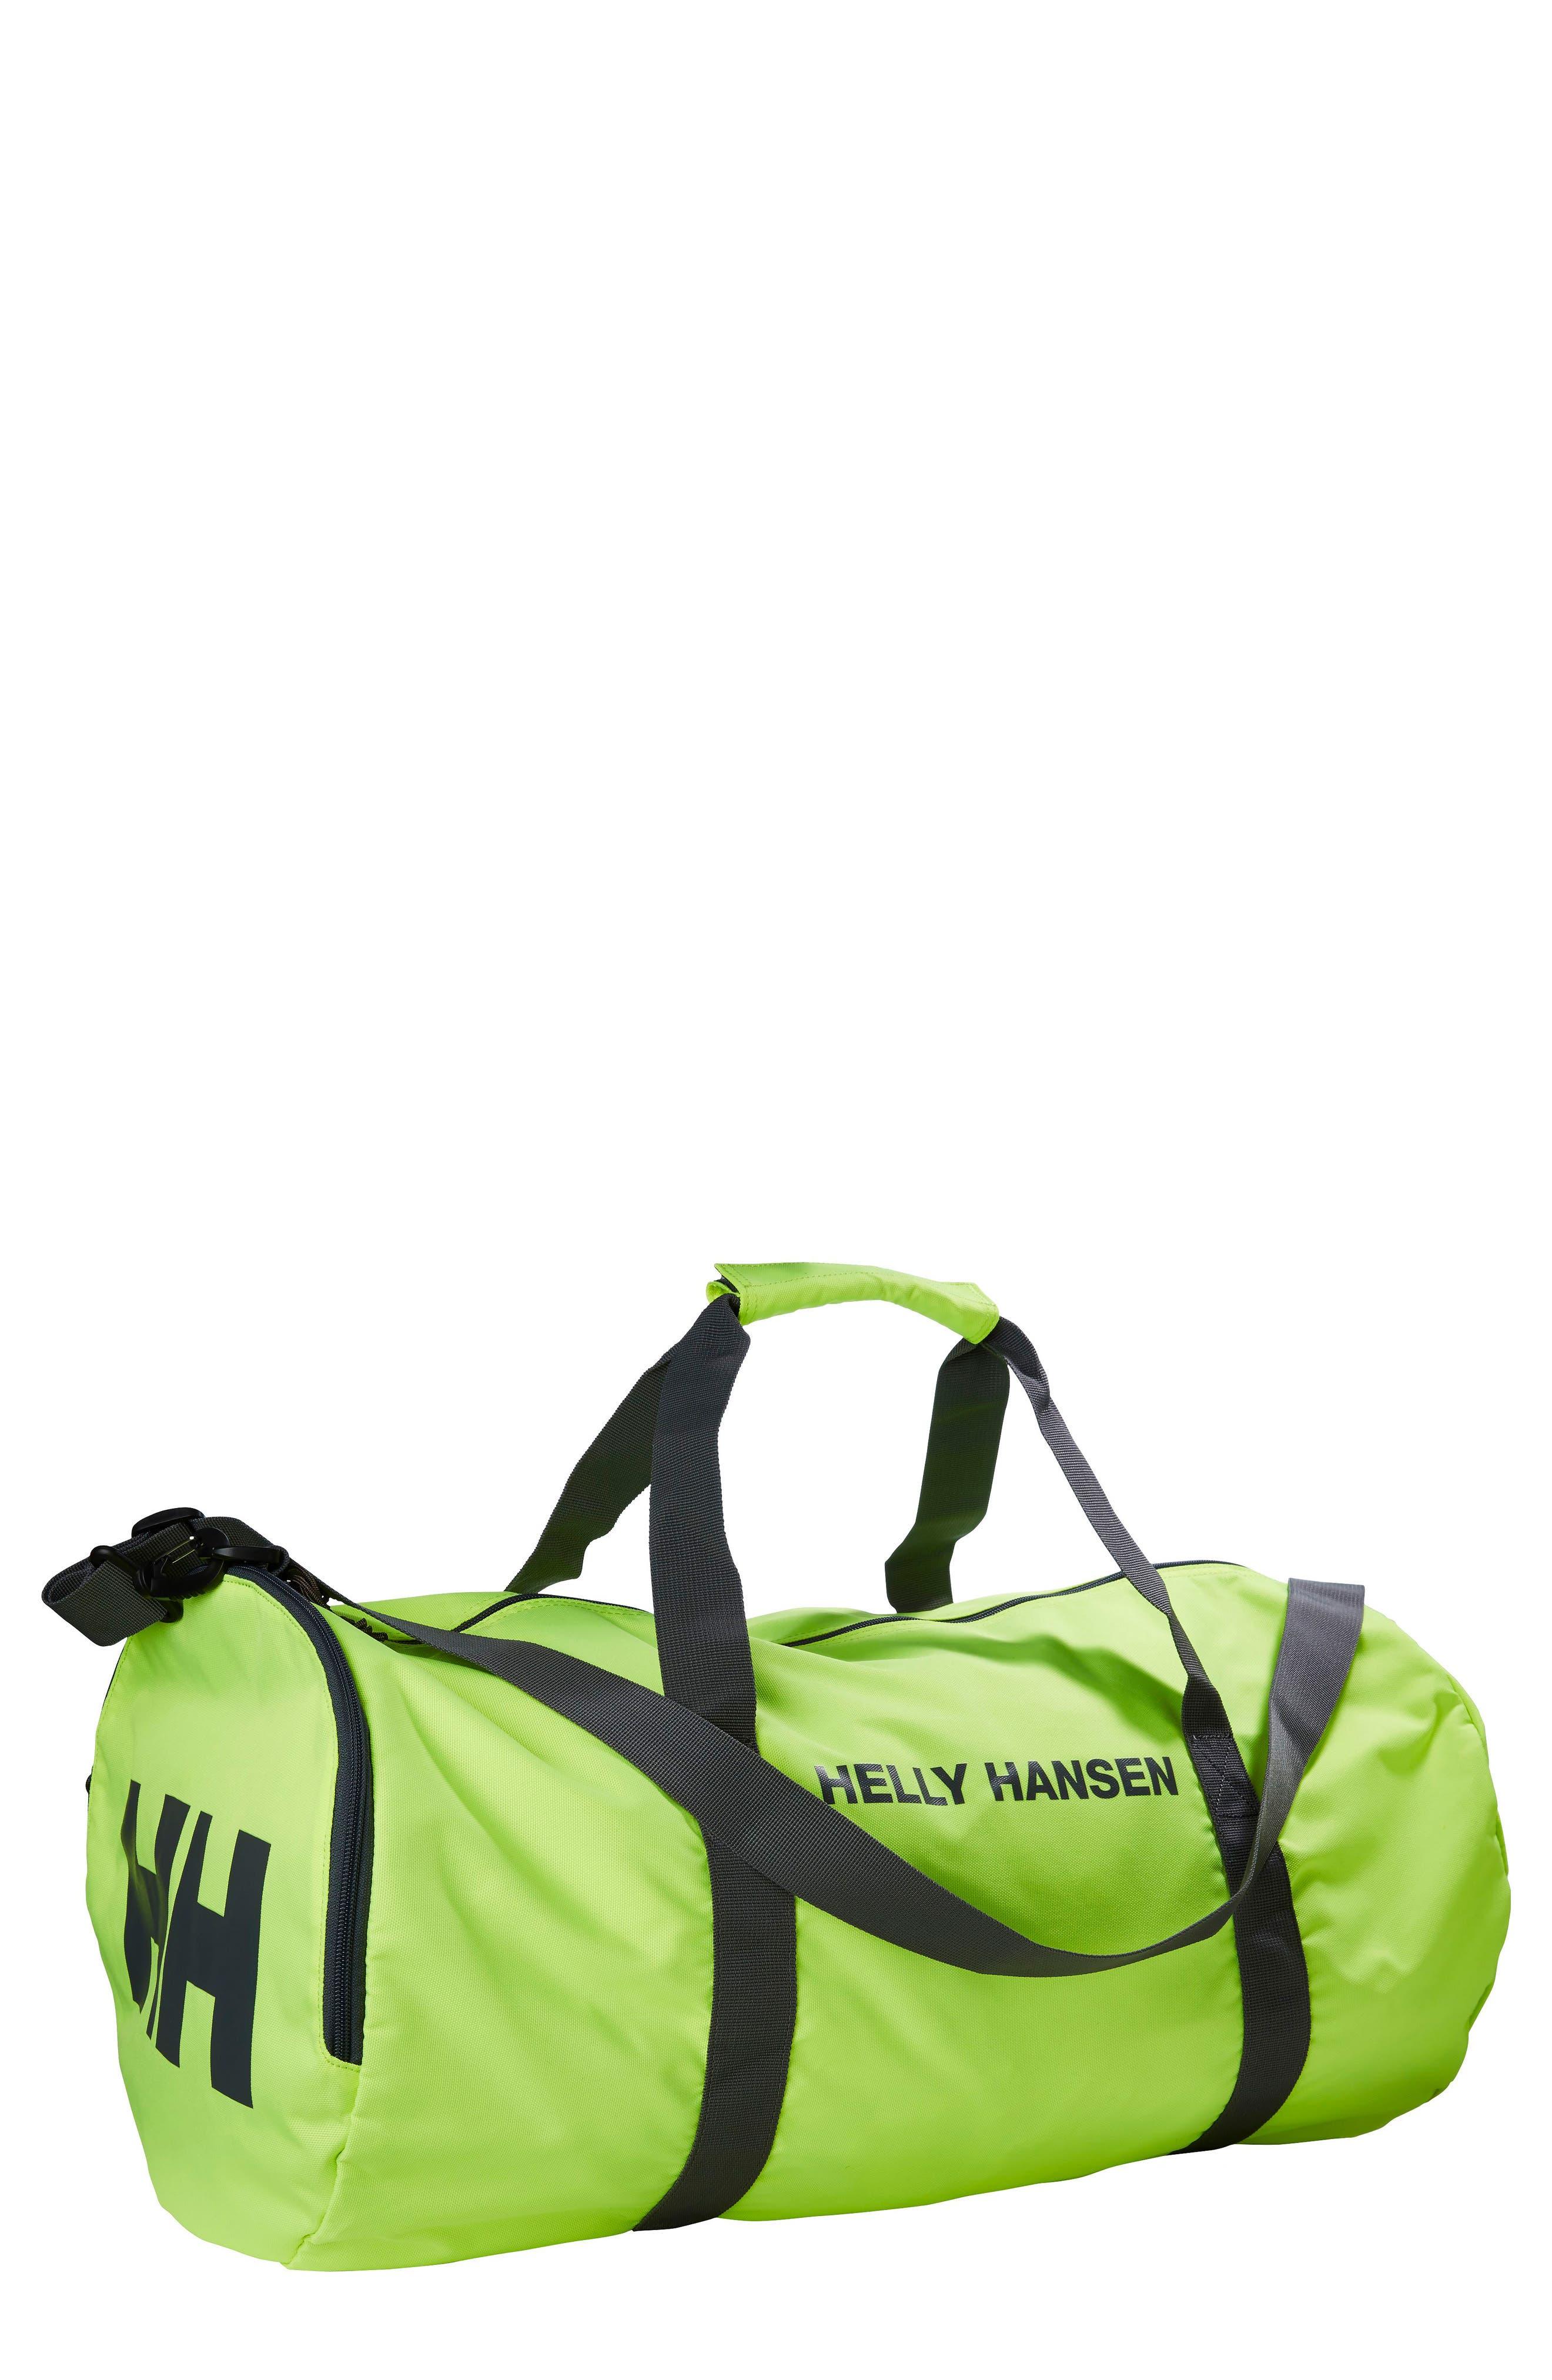 Main Image - Helly Hansen Medium Packable Duffel Bag